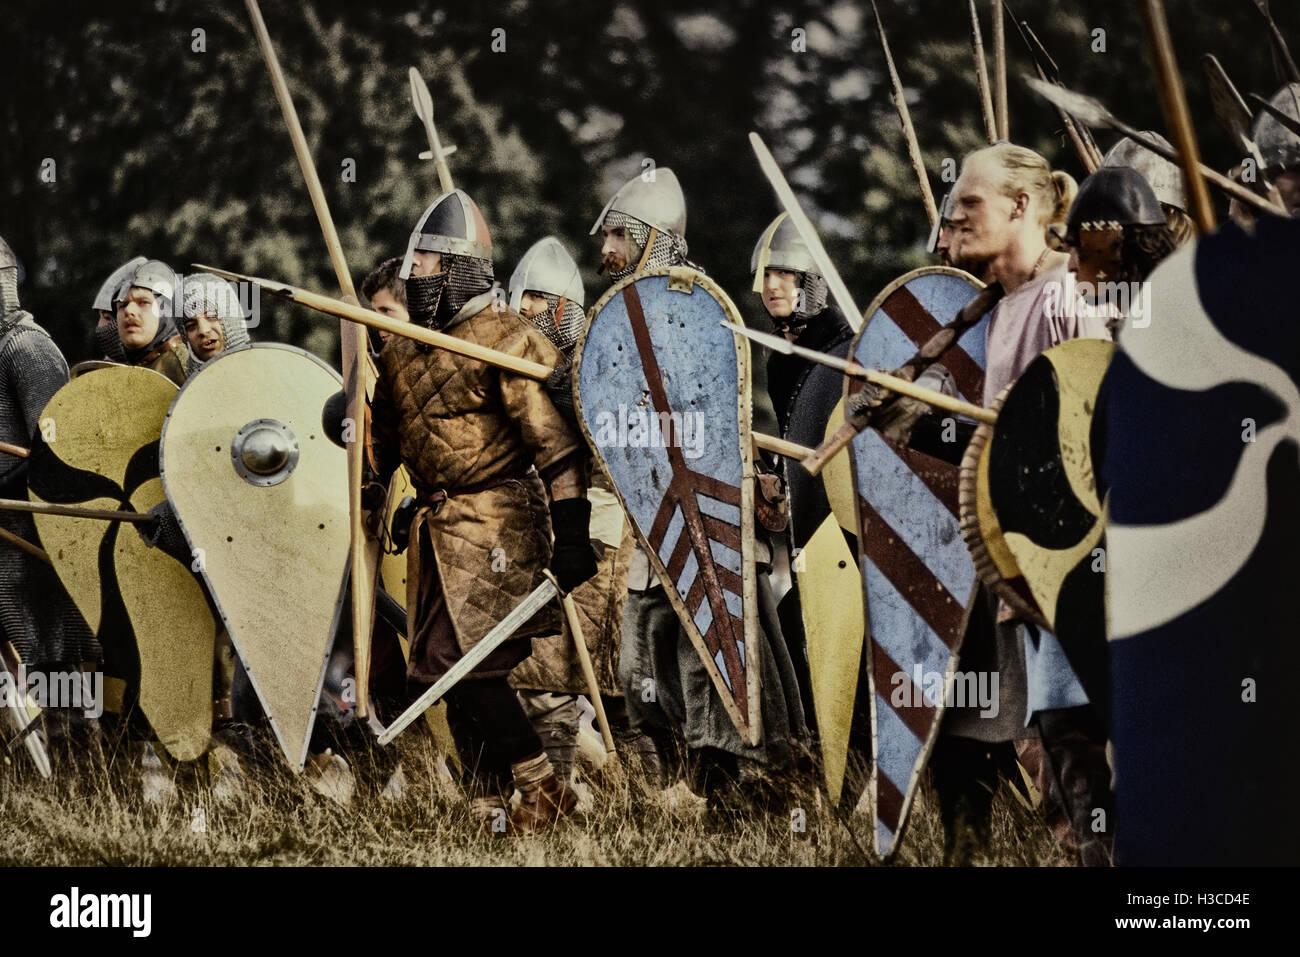 1066 battle of Hastings re-enactment. Battle. East Sussex. England. UK - Stock Image